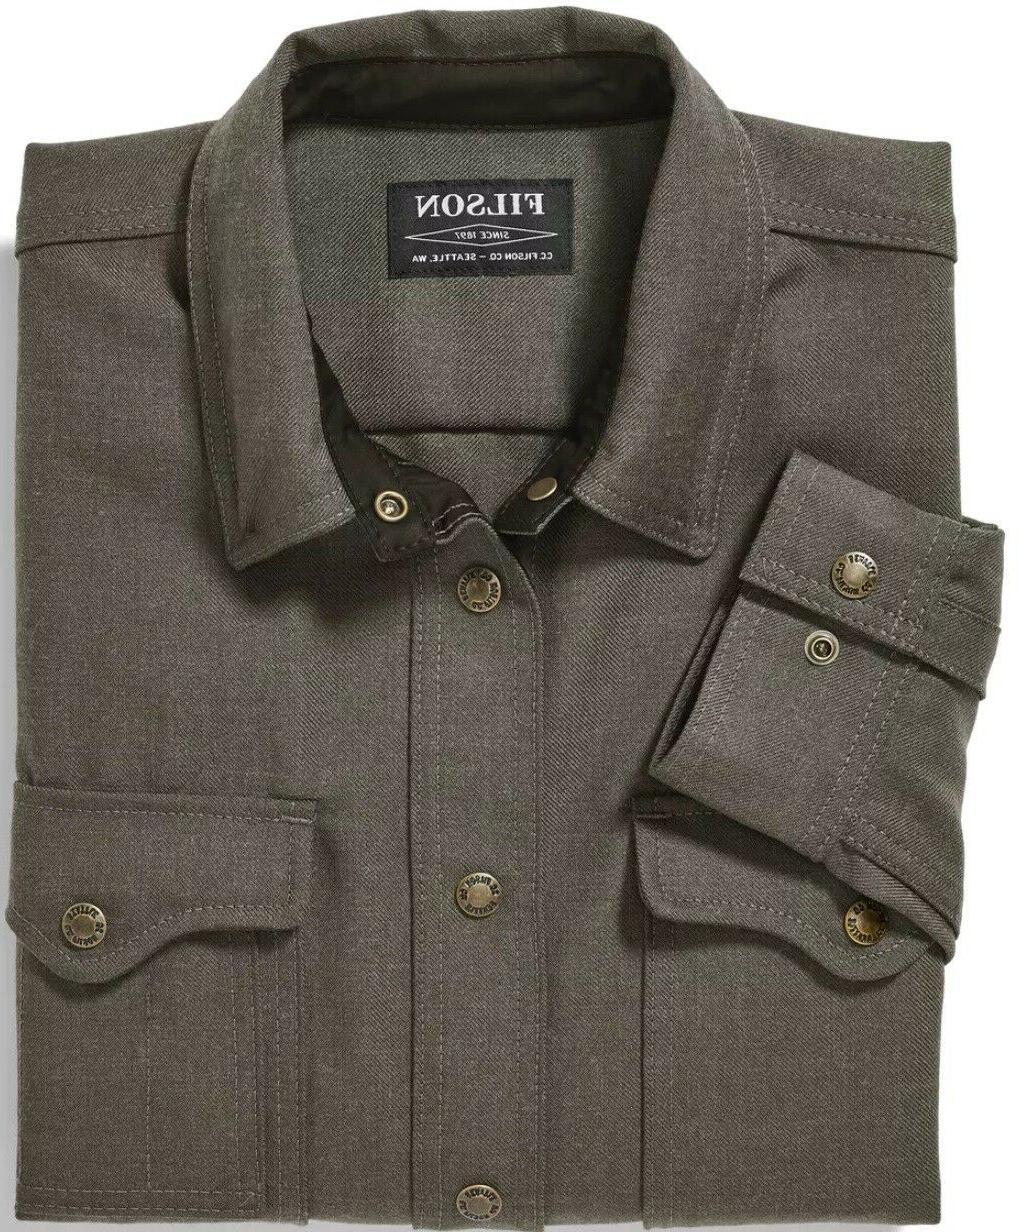 Filson Cloth Wool, Men's MSRP $250